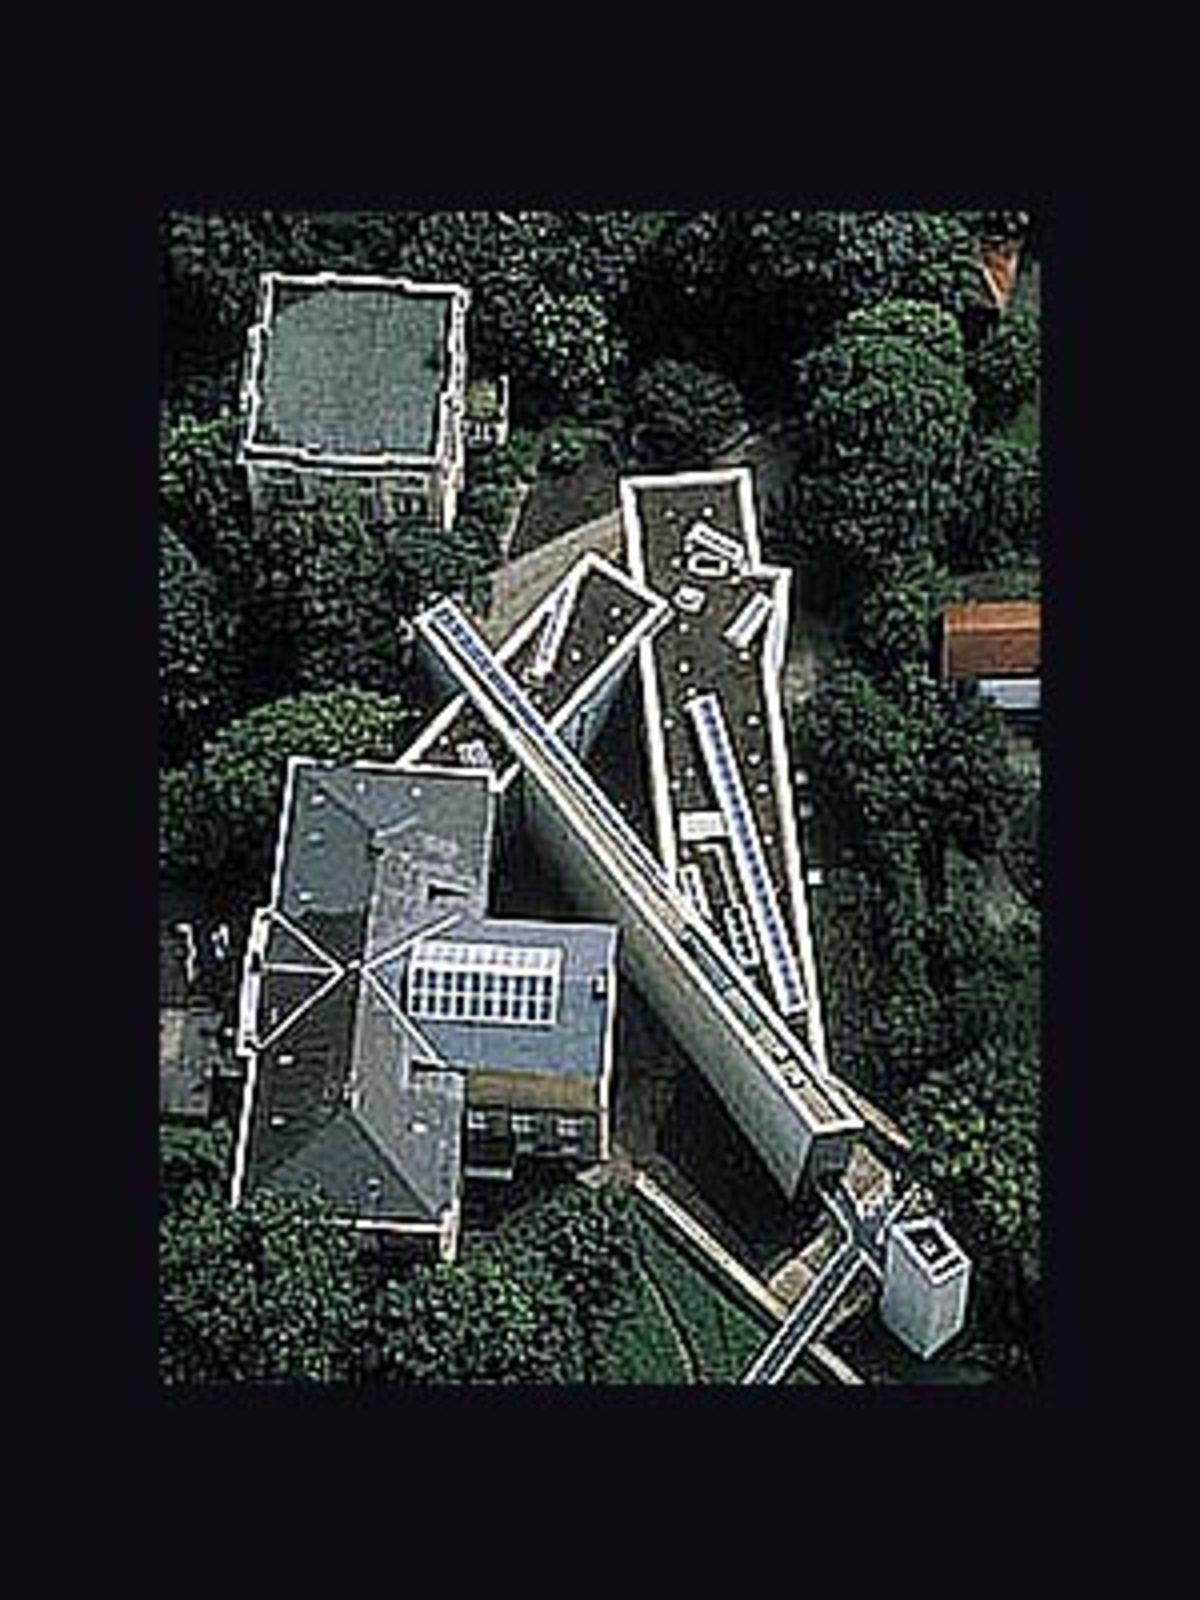 Felix Nussbaum Museum Osnabrueck Germany 1994 Daniel